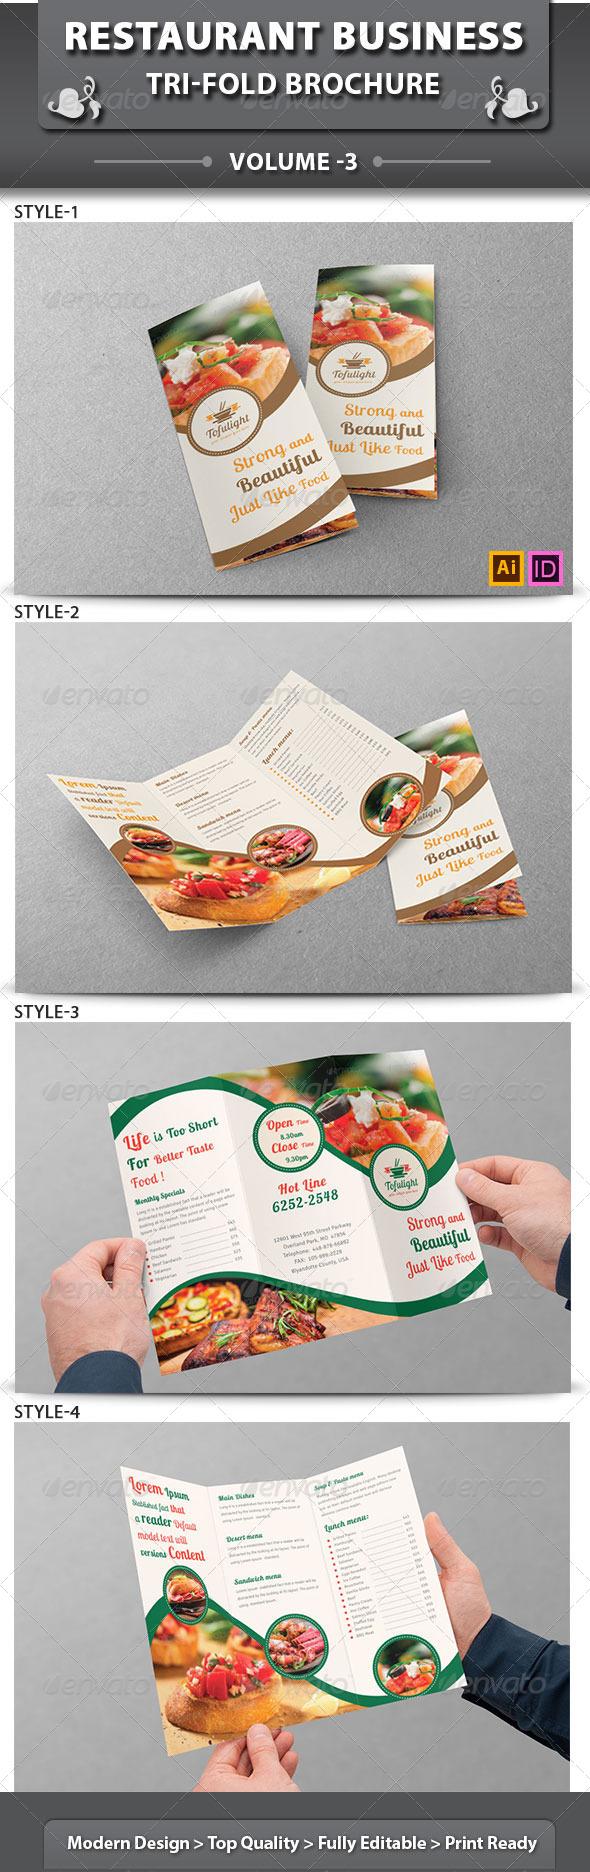 GraphicRiver Restaurant Business Tri-Fold Brochure Volume 3 6541229